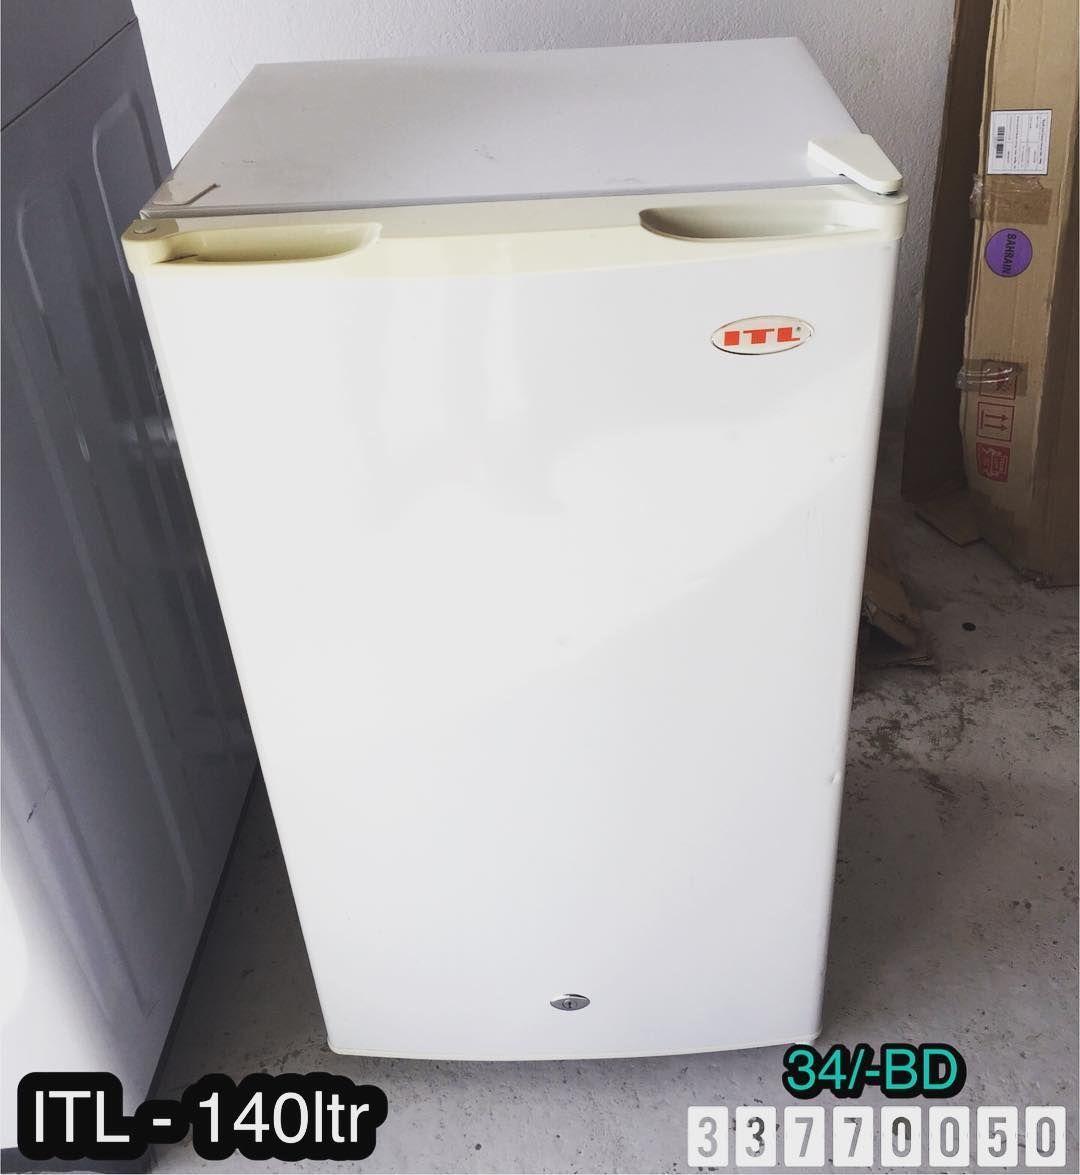 For Sale Itl Refrigerator 140ltr Model Yz 140l Excellent Condition Price 34 Bd للبيع ثلاجة صغيرة ماركة Itl 140 لتر Trash Can Tall Trash Can Trash